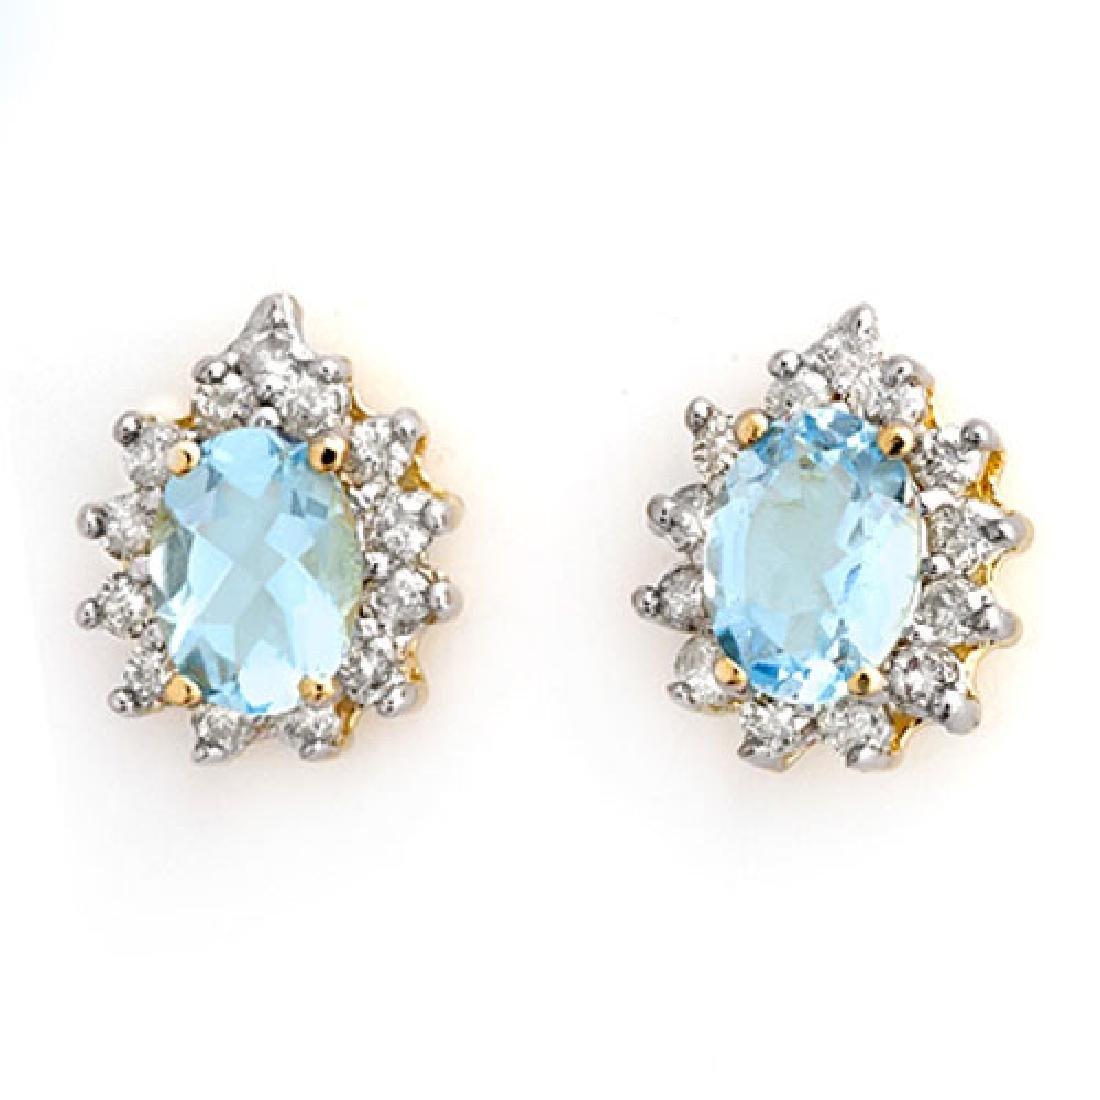 3.75 CTW Aquamarine & Diamond Earrings 14K Yellow Gold